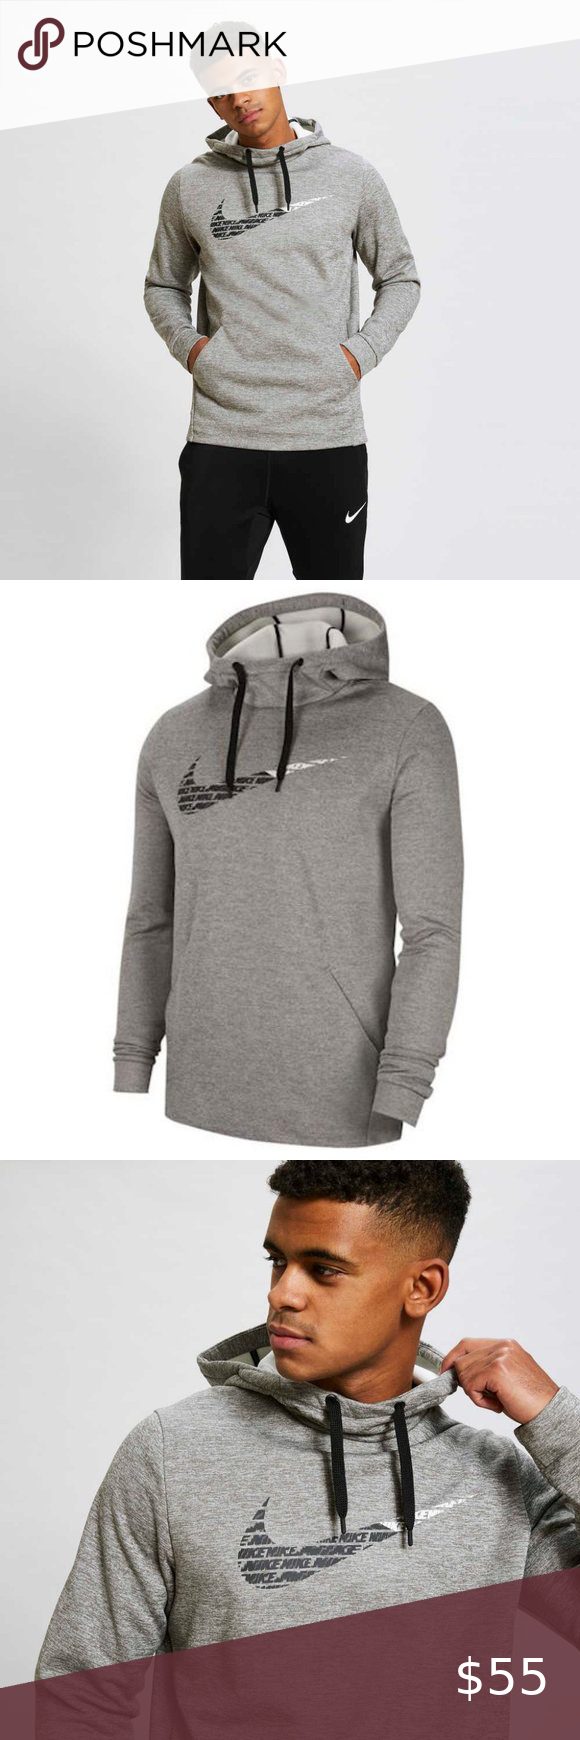 Nike Therma Gfx 2 2 Hooded Sweatshirt Hooded Sweatshirts Fashion Grey Nike Hoodie [ 1740 x 580 Pixel ]